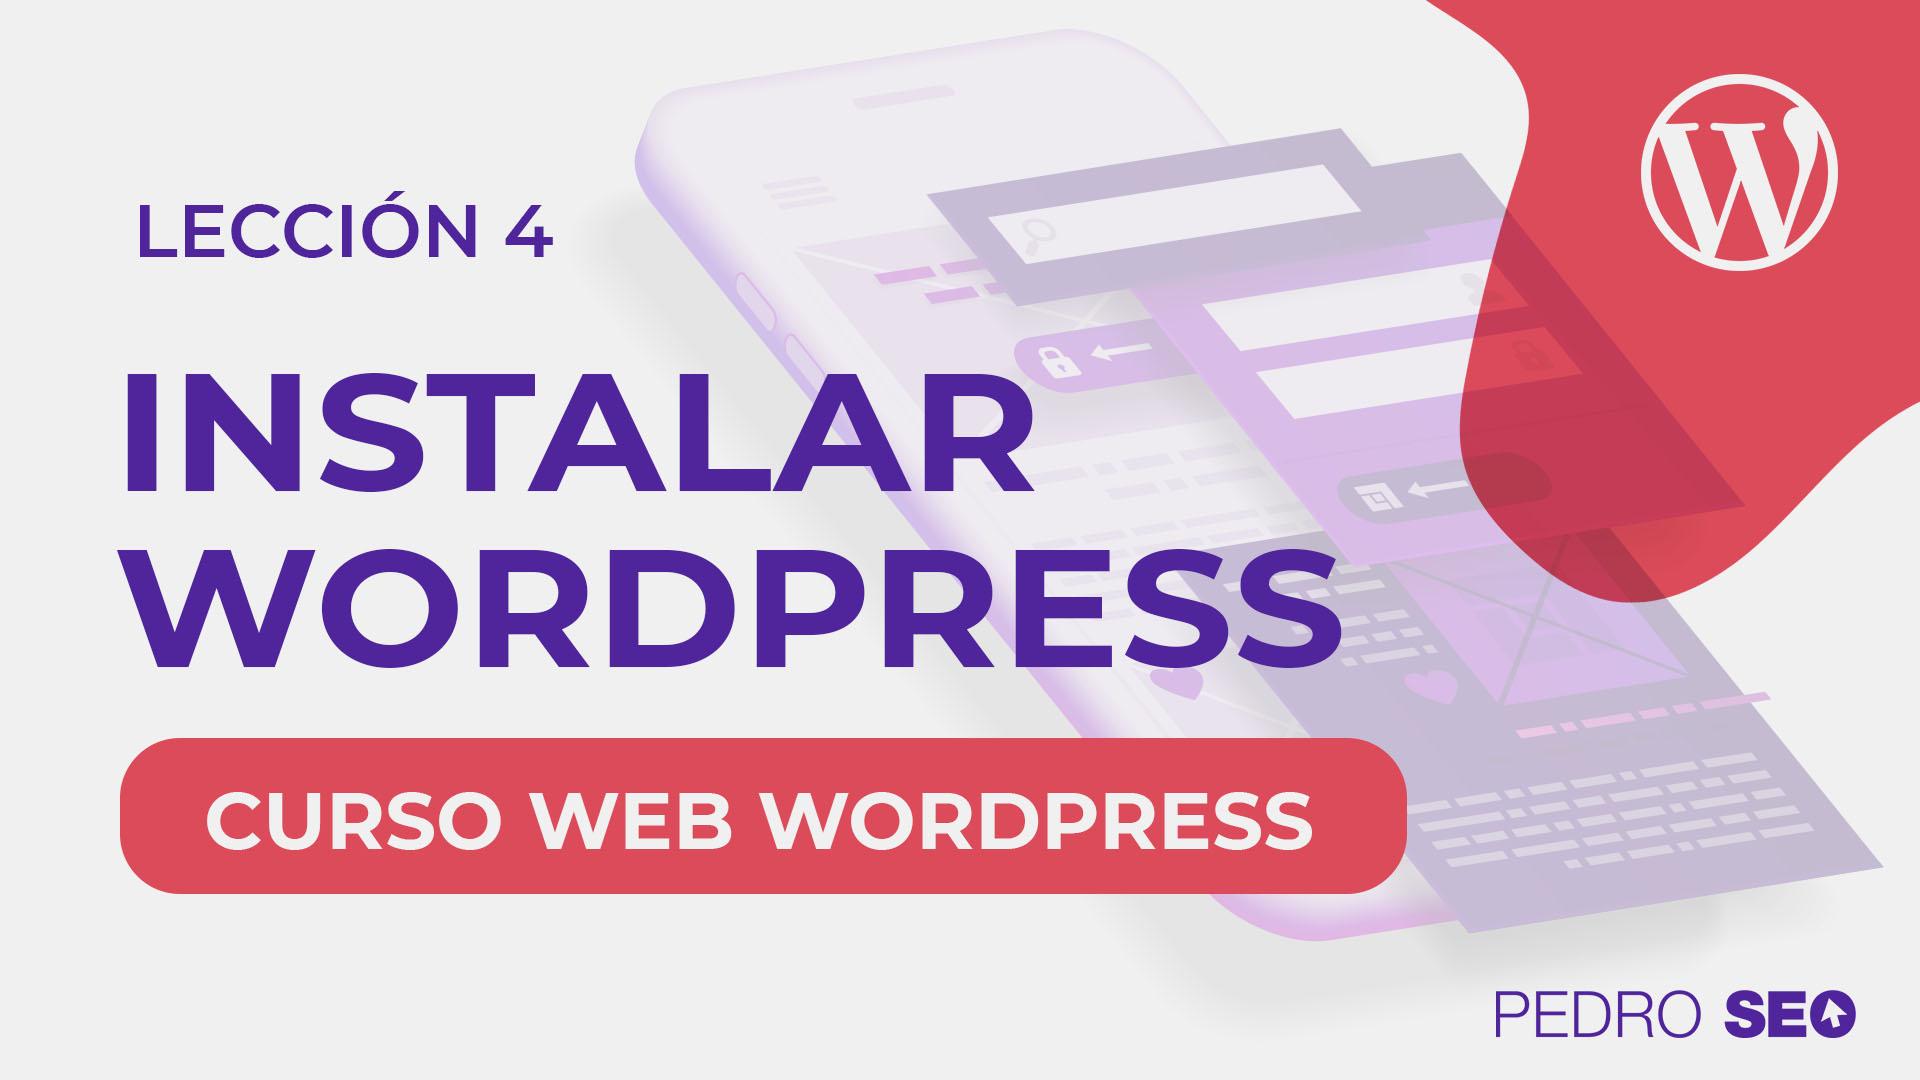 Instalar wordpress paso a paso